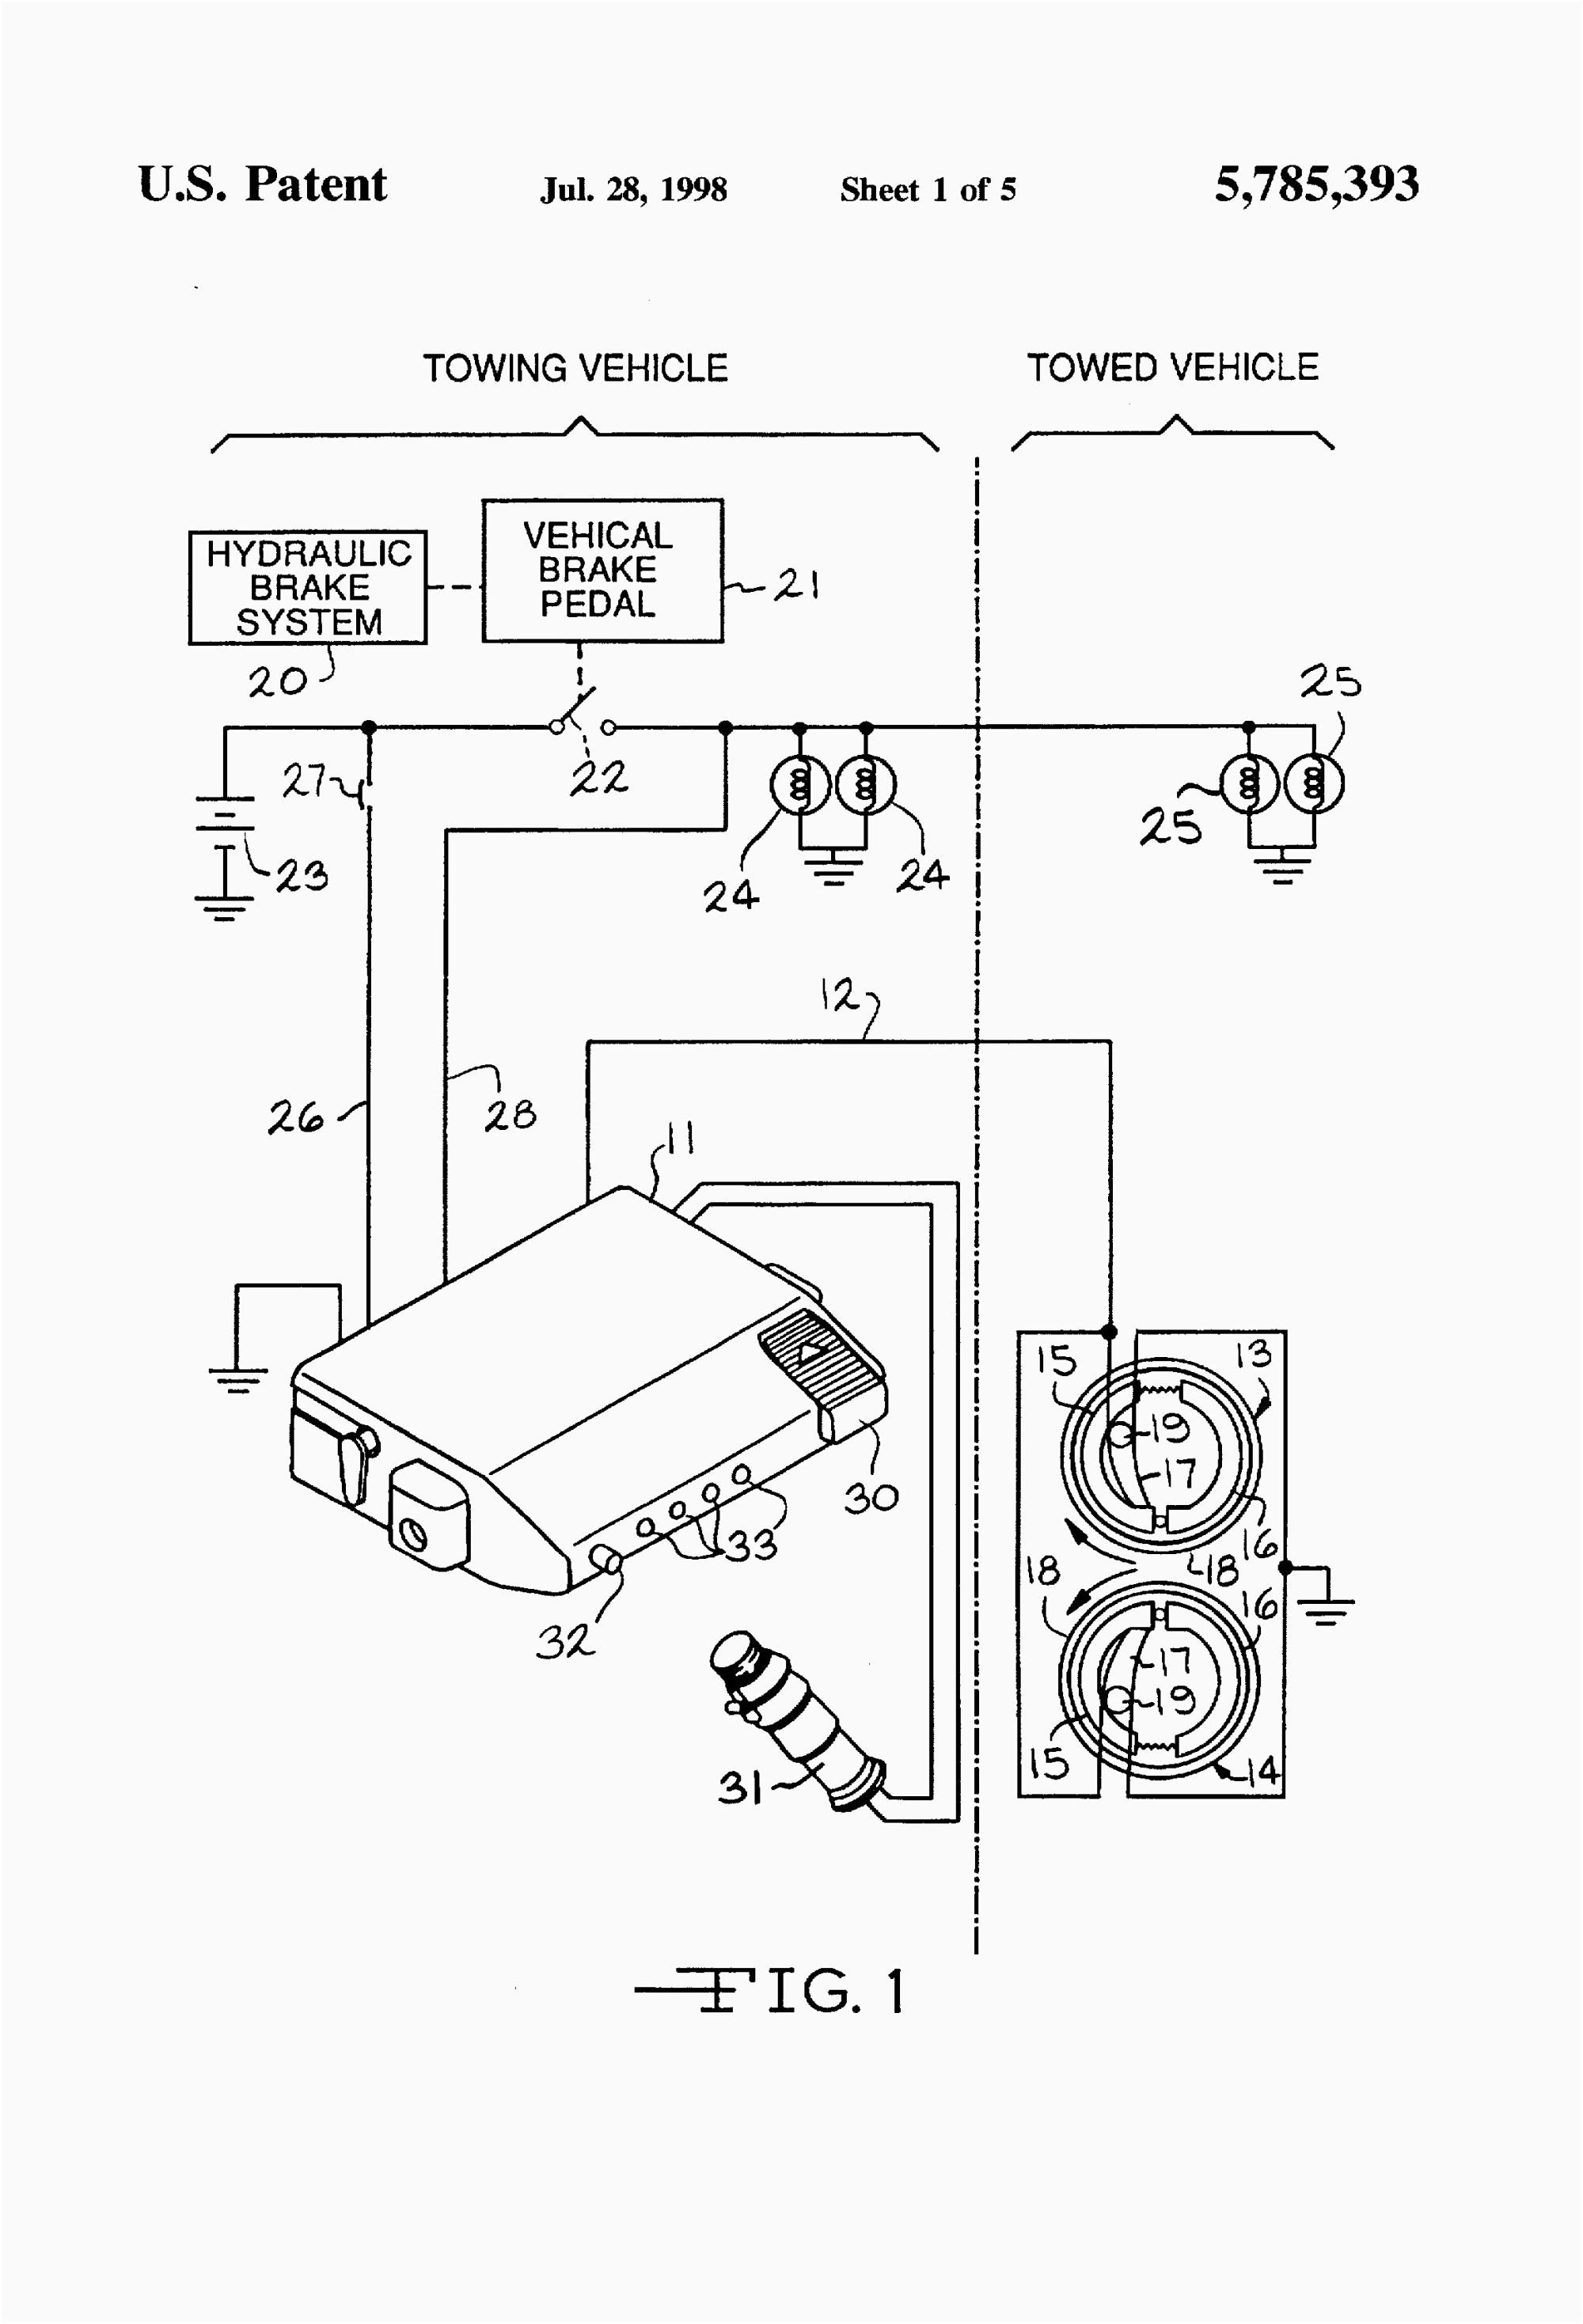 hight resolution of trailer breakaway battery wiring diagram electric trailer brakes wiring diagram wiring diagram of trailer breakaway battery